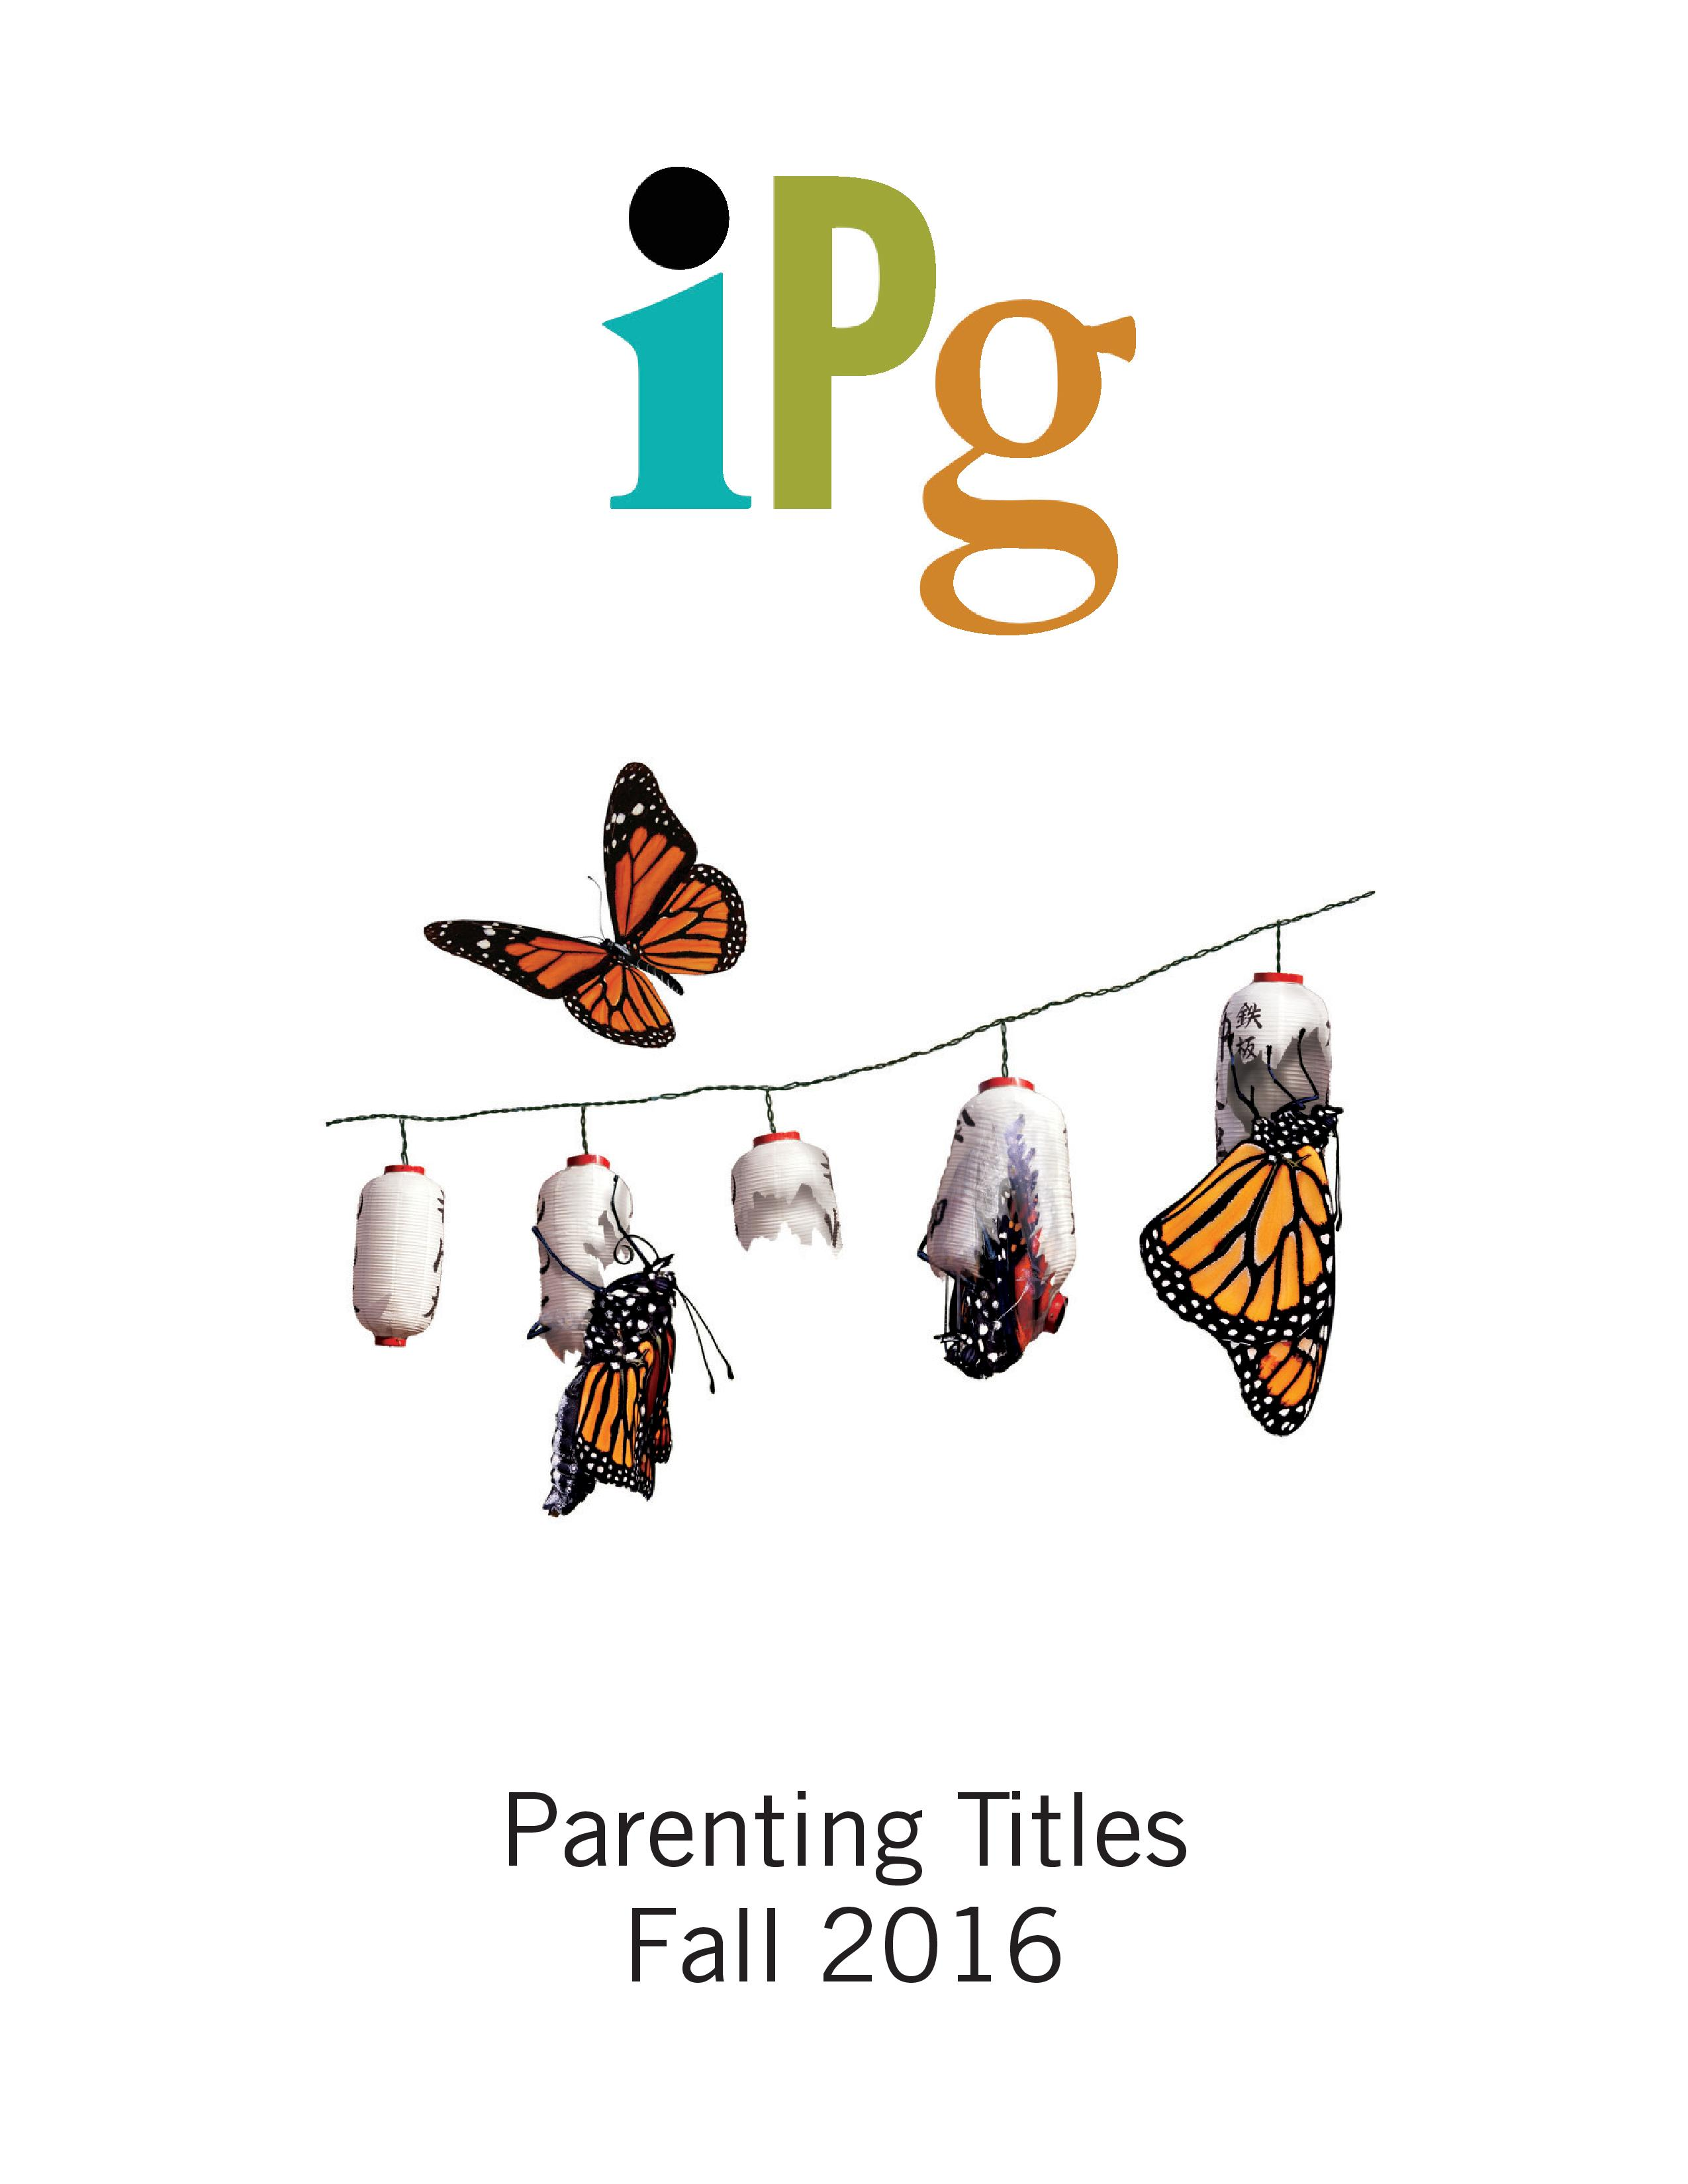 Parenting Titles